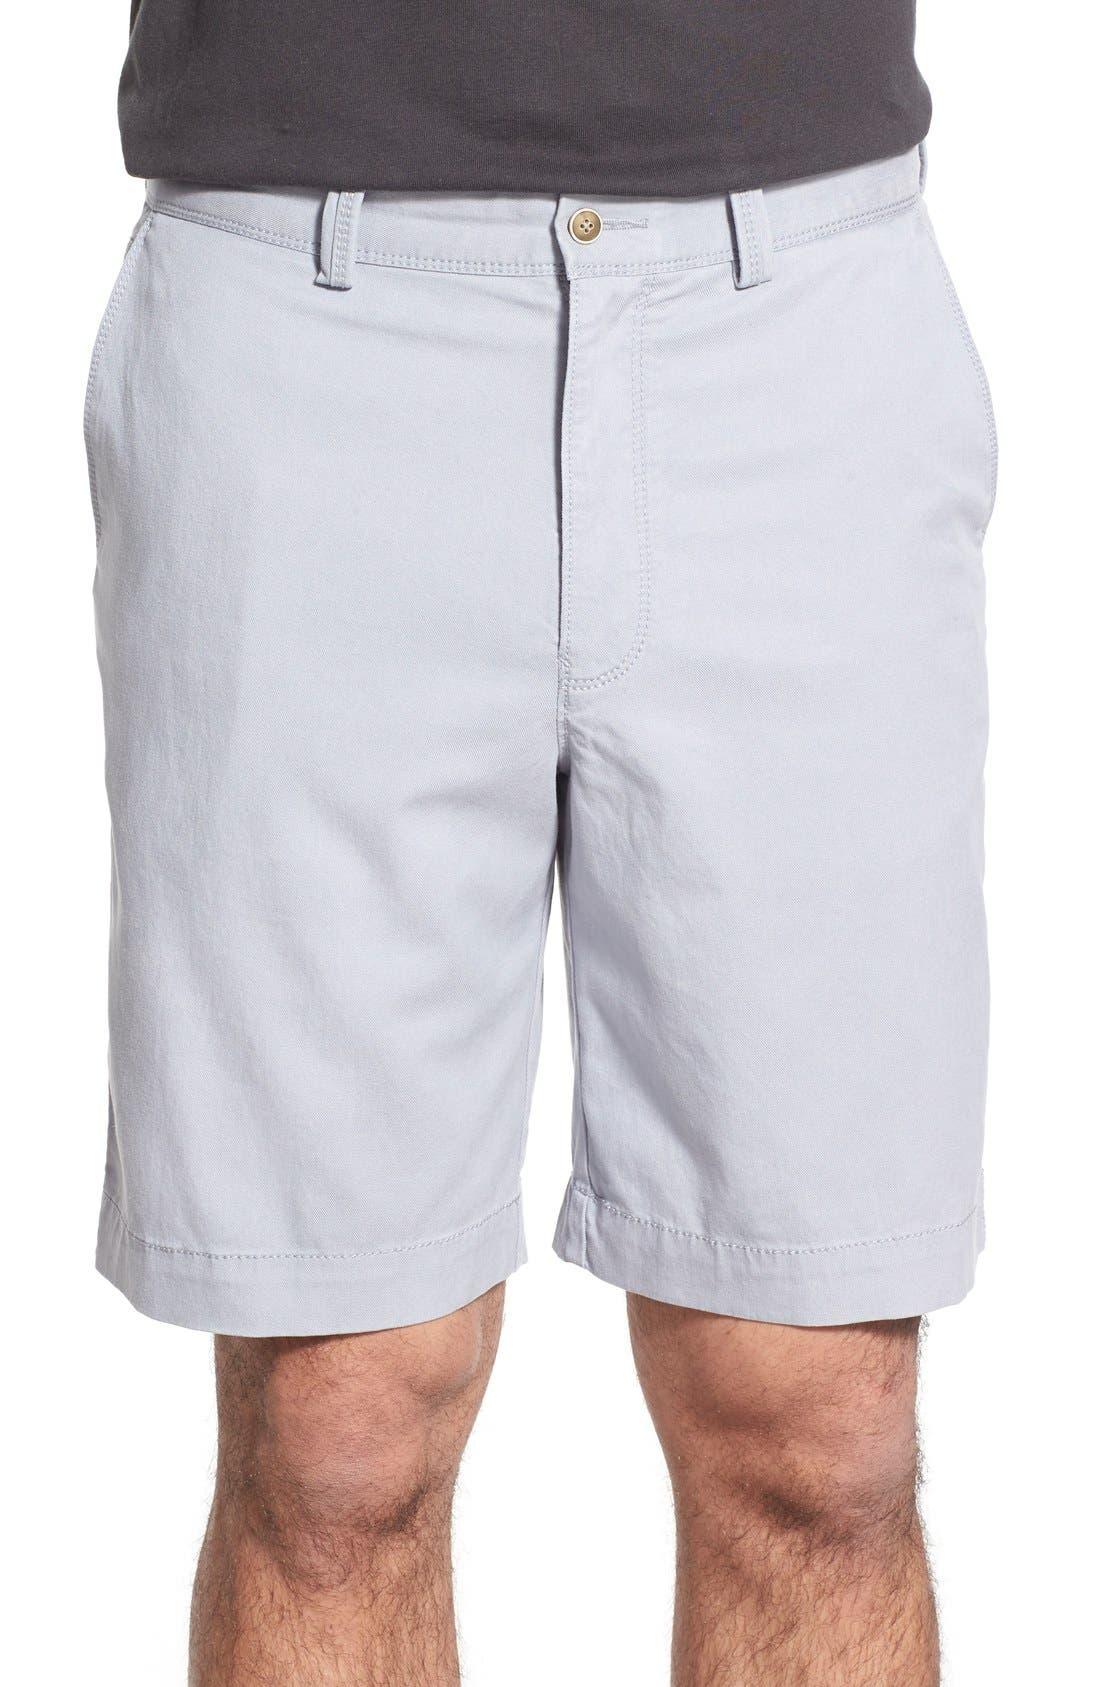 Alternate Image 1 Selected - Tommy Bahama 'Ashore Thing' Flat Front Shorts